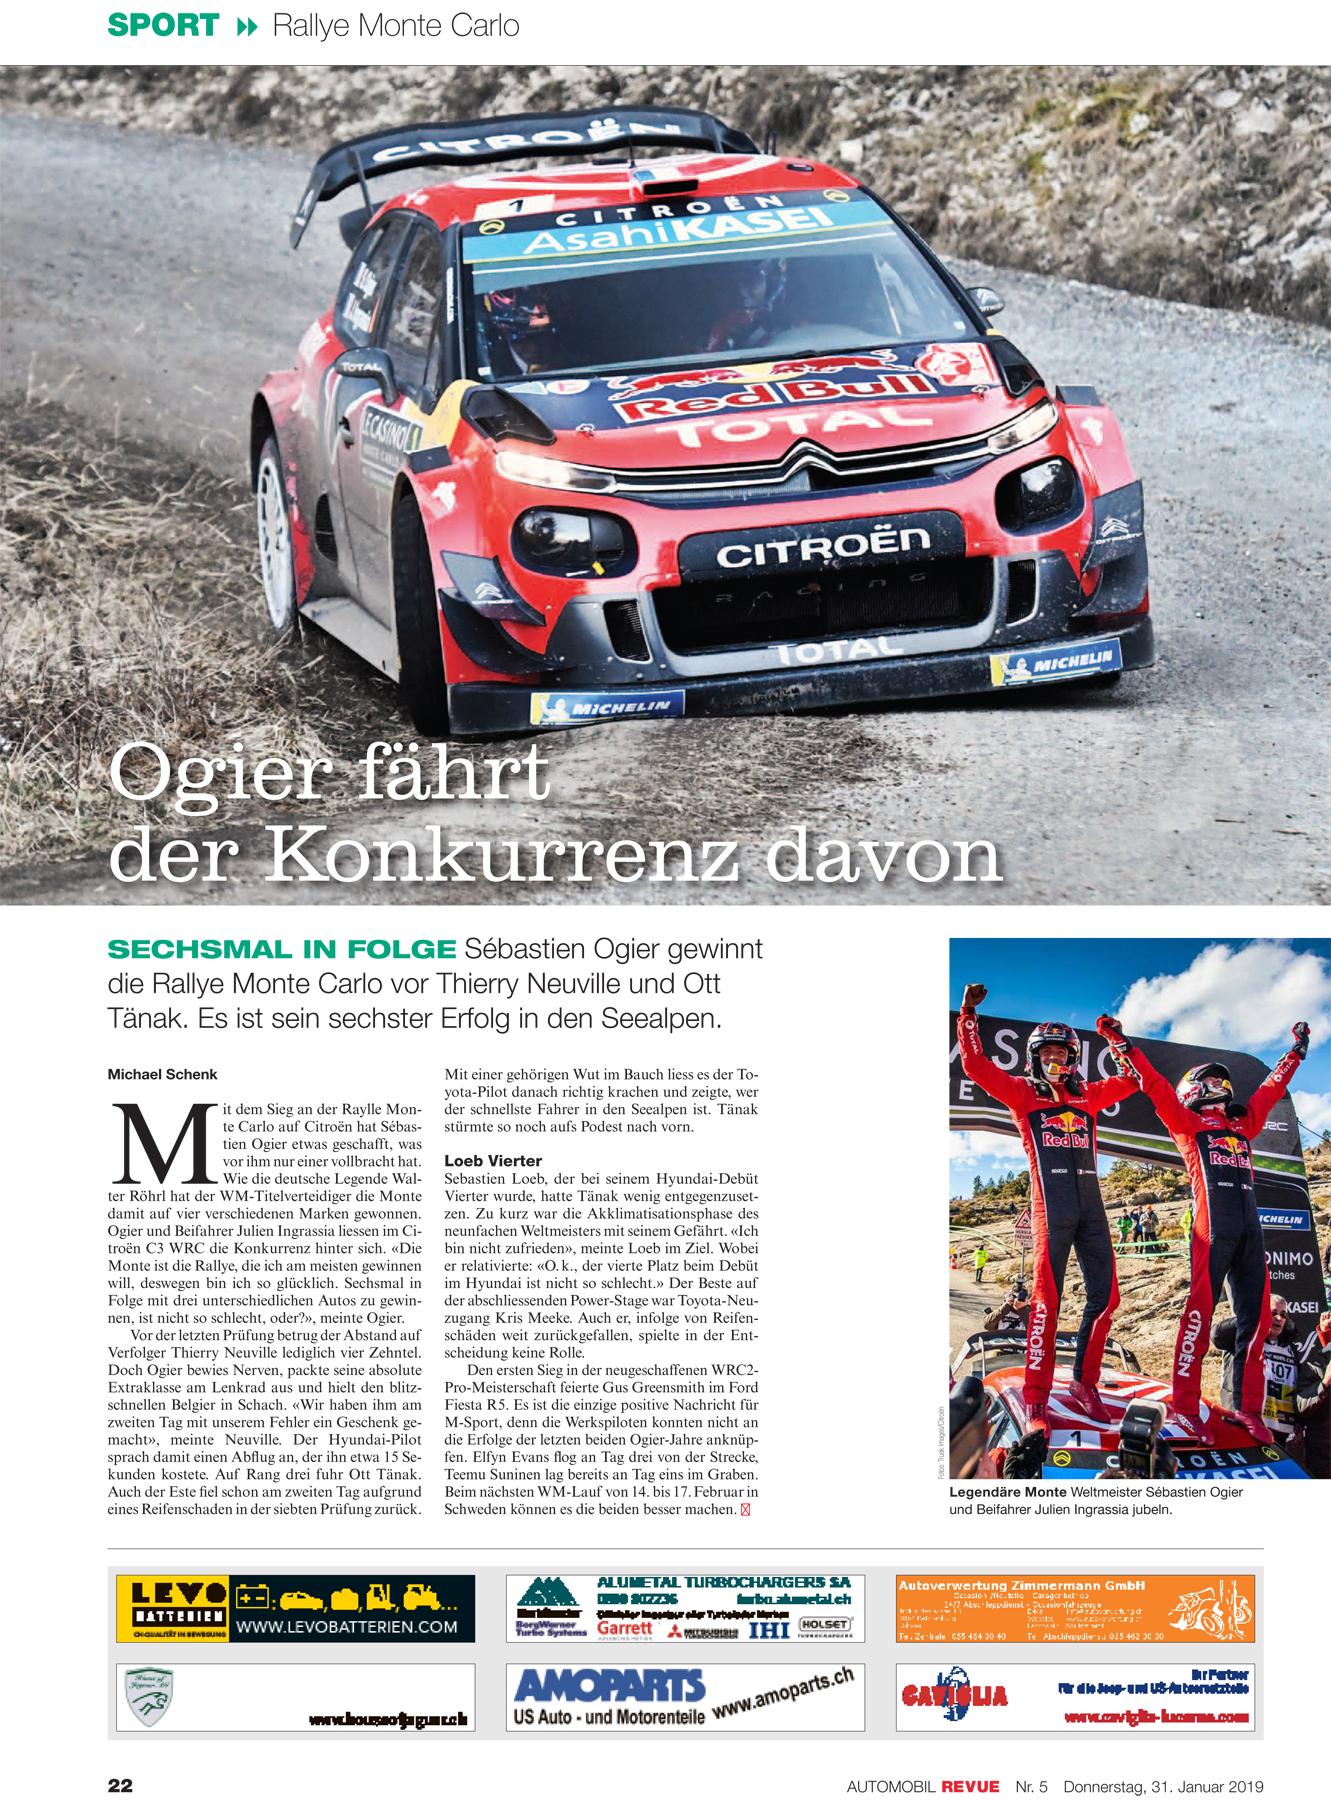 Automobil Revue N° 5/2019